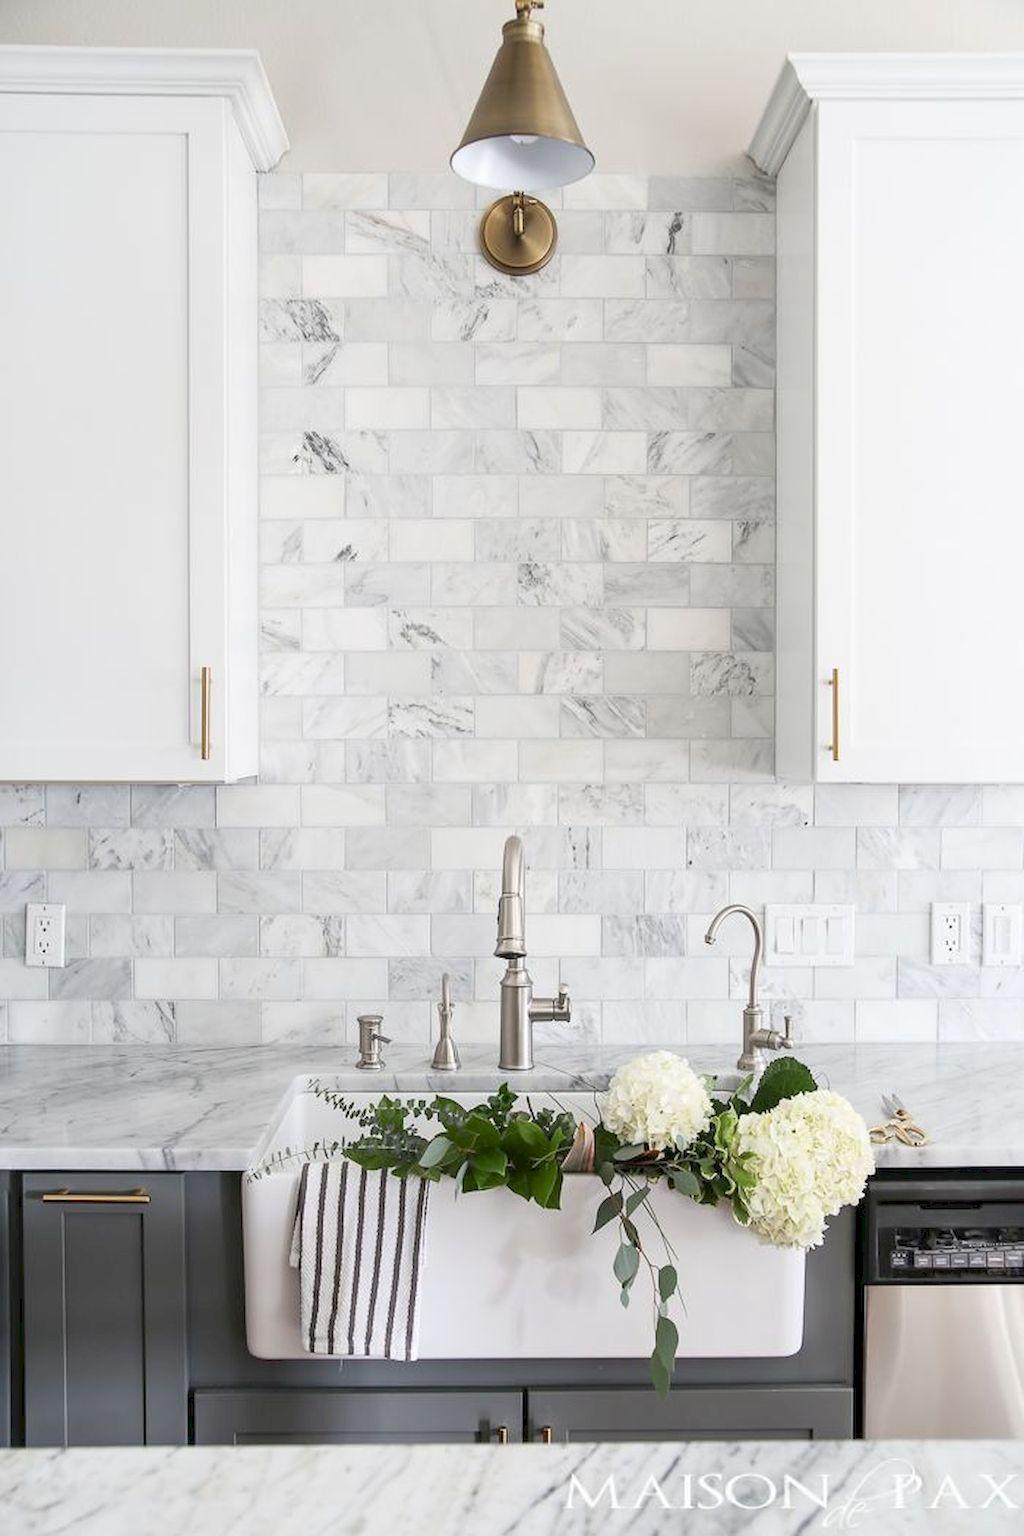 Stunning kitchen backsplash ideas houseyy pinterest kitchens